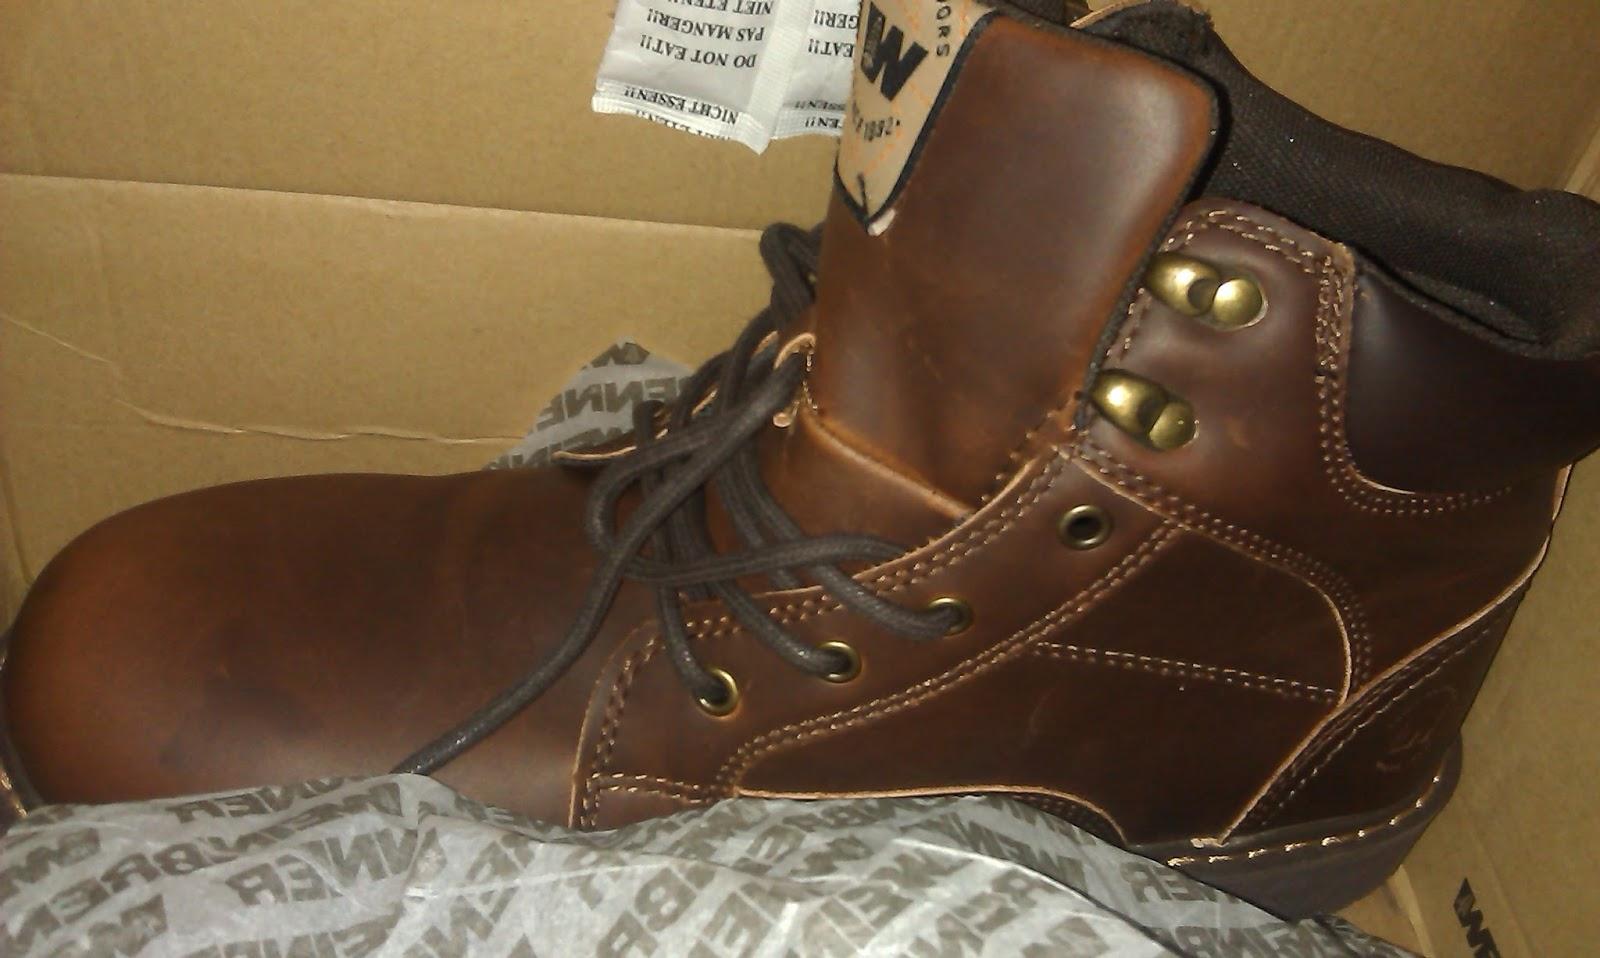 Untuk sepatu saya selalu pakai yang cocok untuk naik motor. Biasanya model  boots. Untuk merk biasanya pakai Rockport ada satu Timberland 3c28dccca1